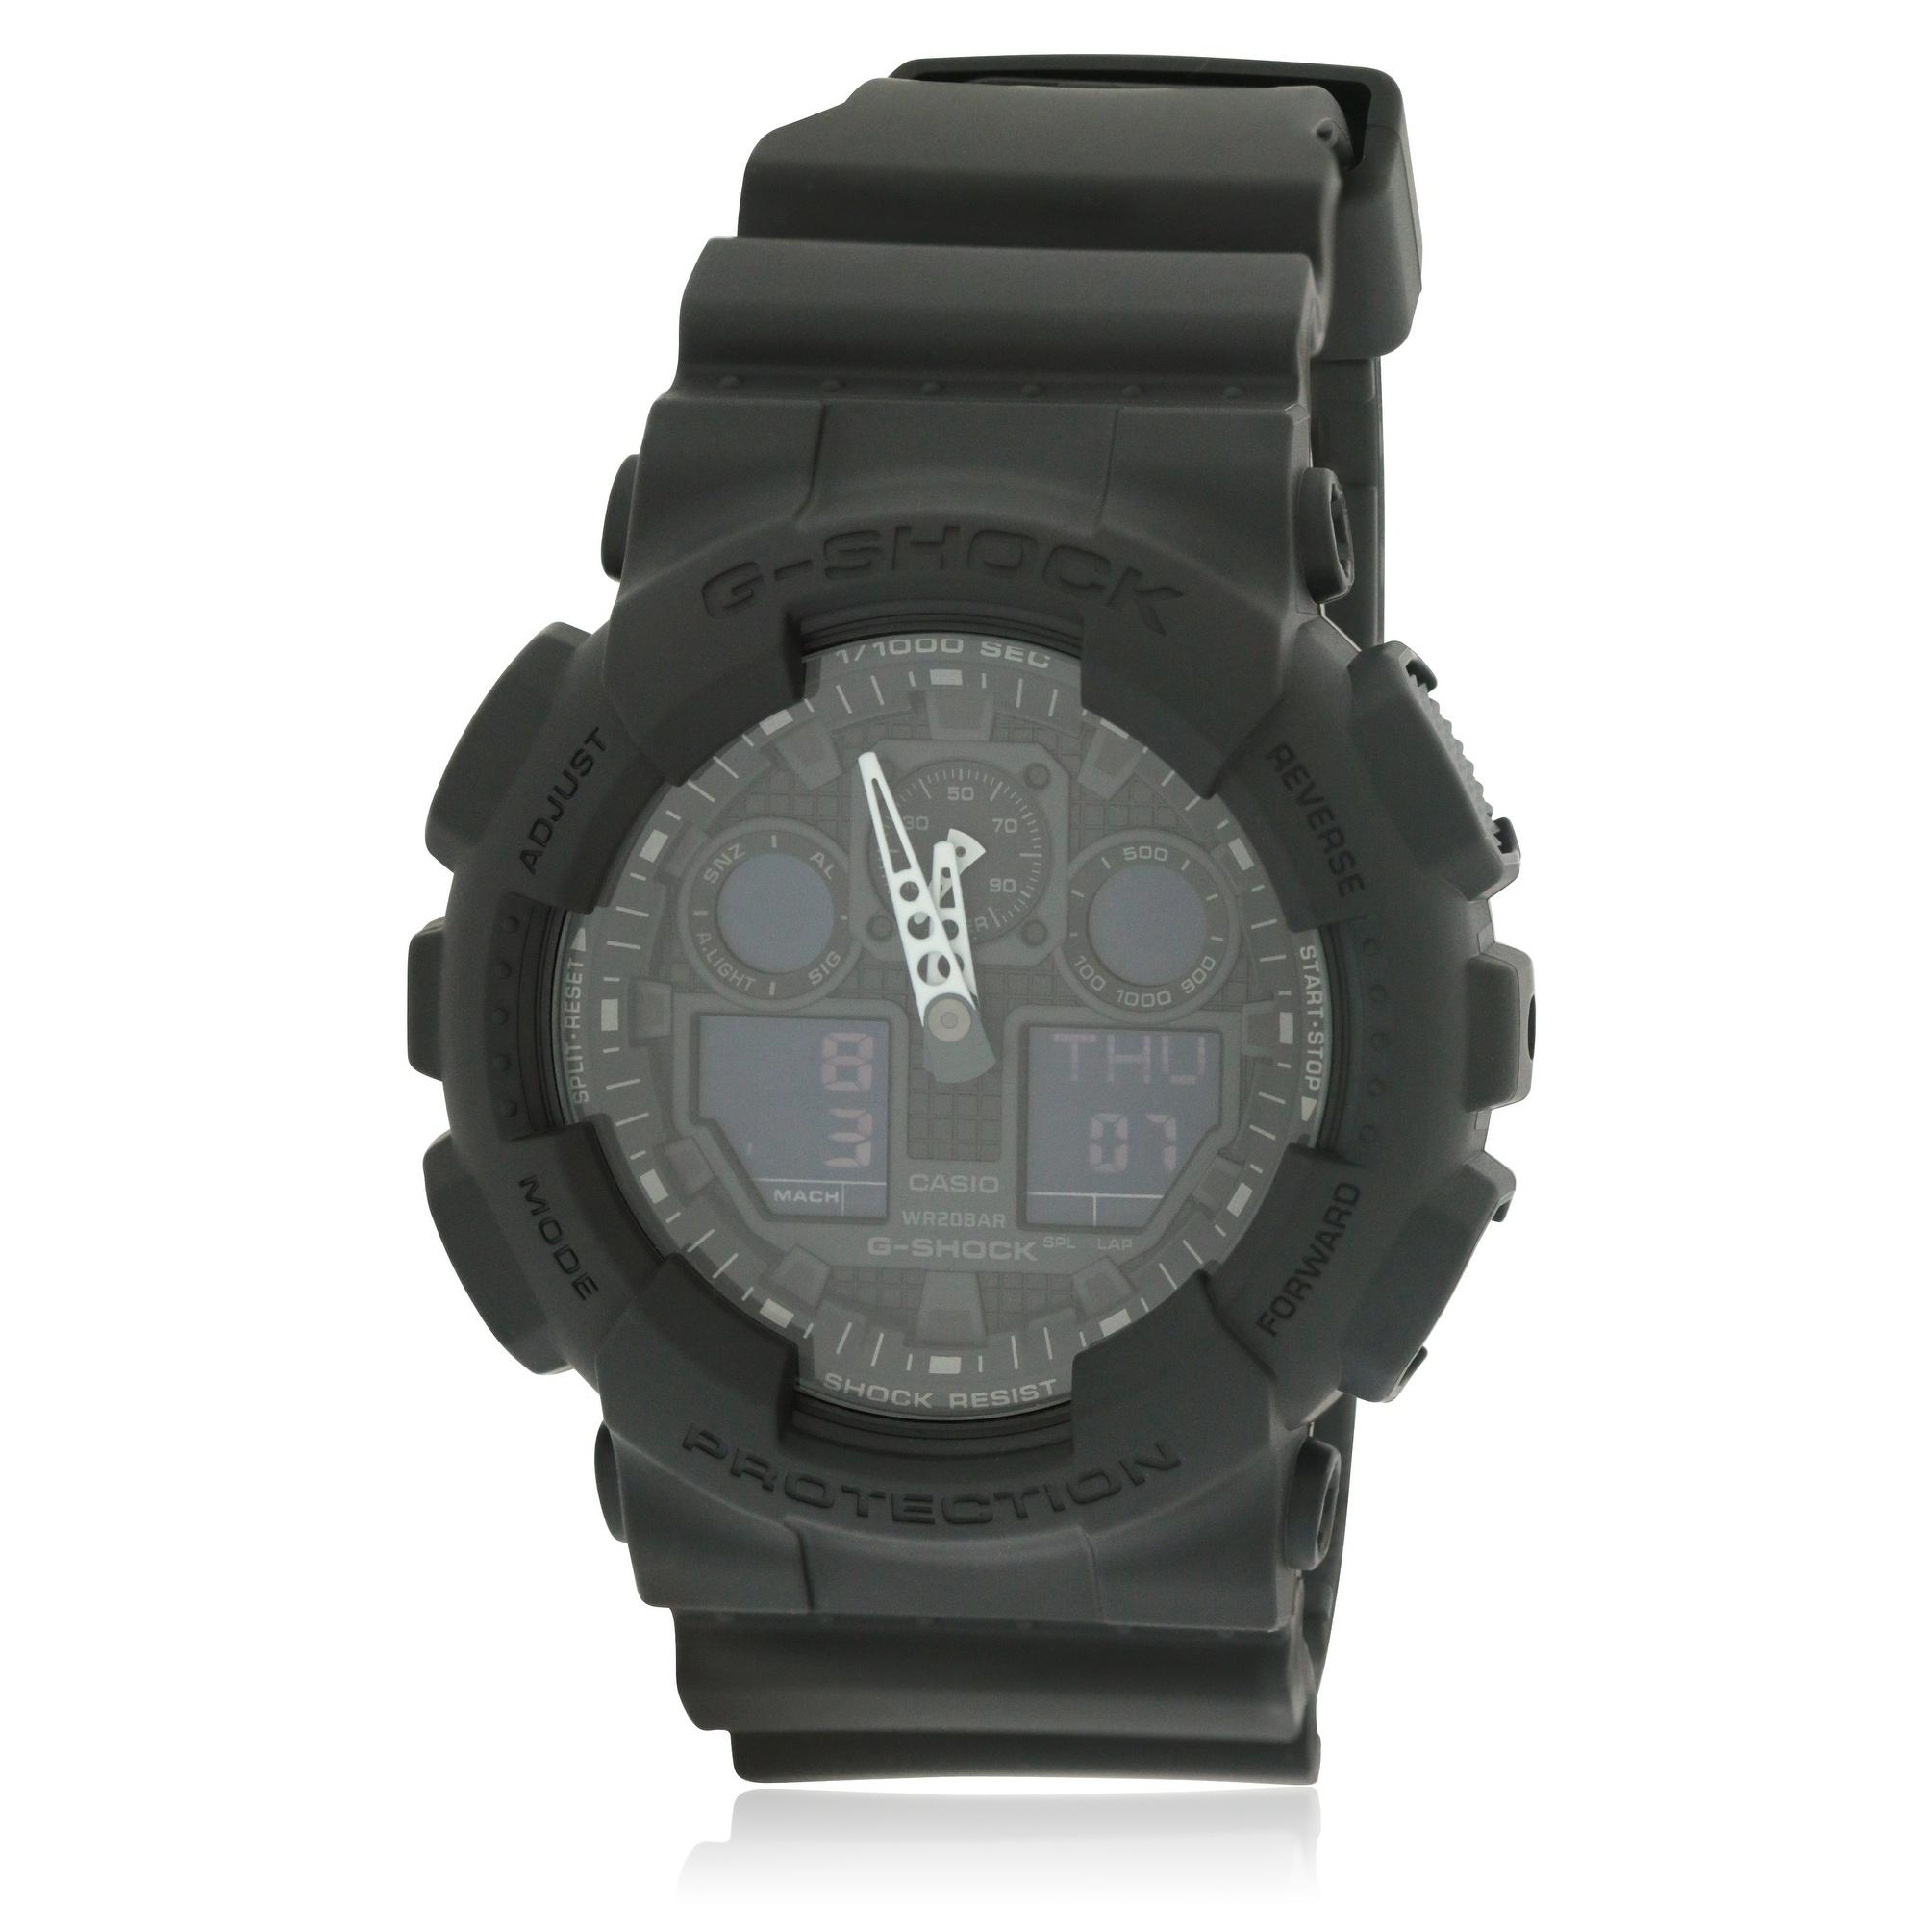 Casio G-Shock Mens Watch GA100-1A1, Black, Size One Size ...